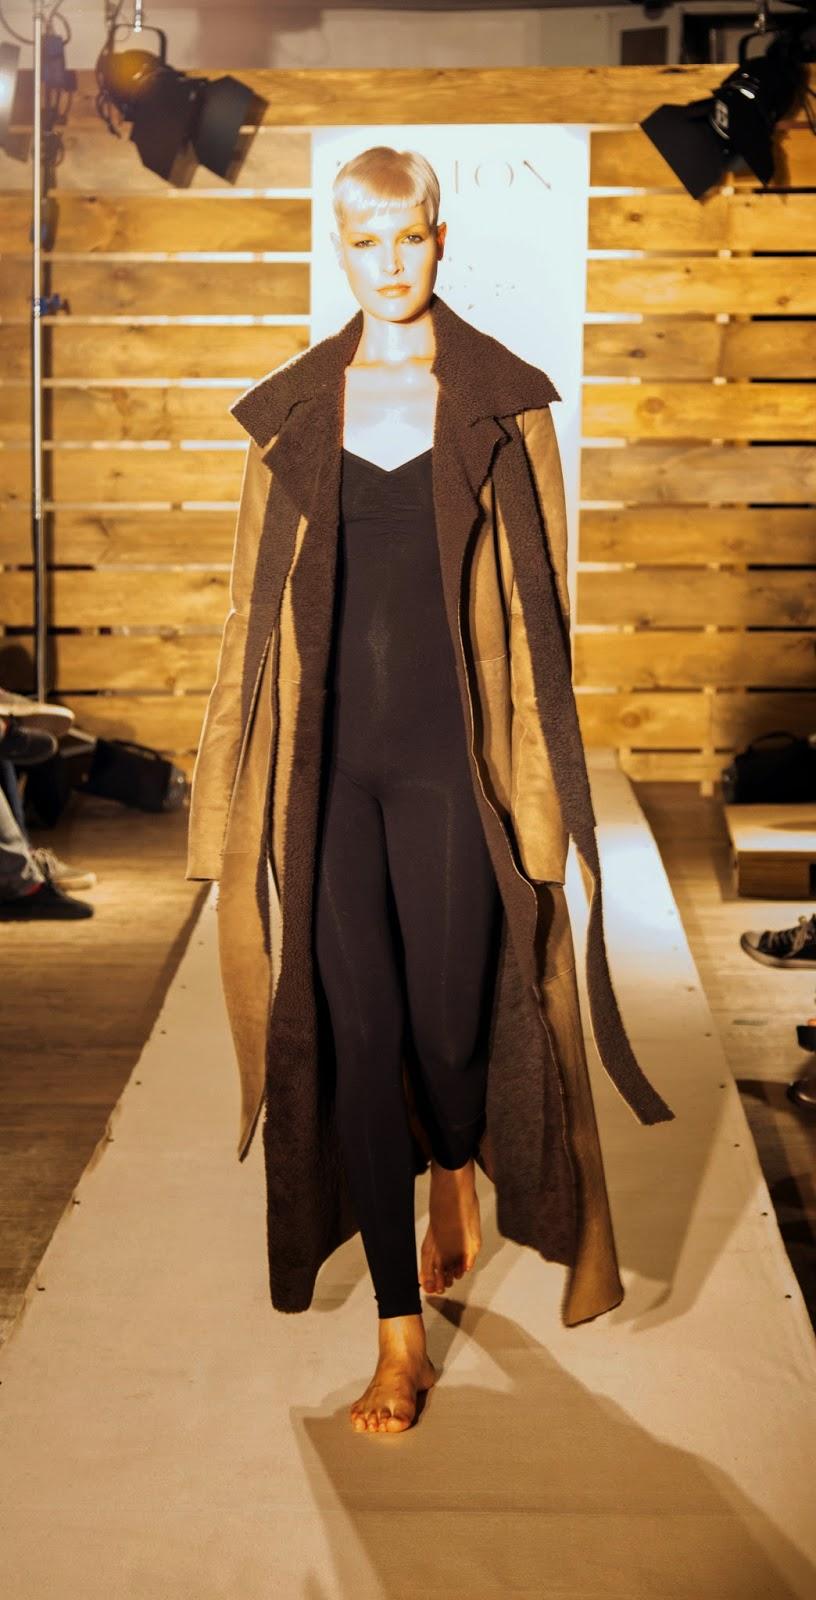 REVLON Profesional, Yaellagazelle, Elena Benarroch, Mikel Luzea, La Nacional, New York, Elena Estaun, Joselín Vargas, Desfile, NY, Fashion Style, Leather, Street Style,